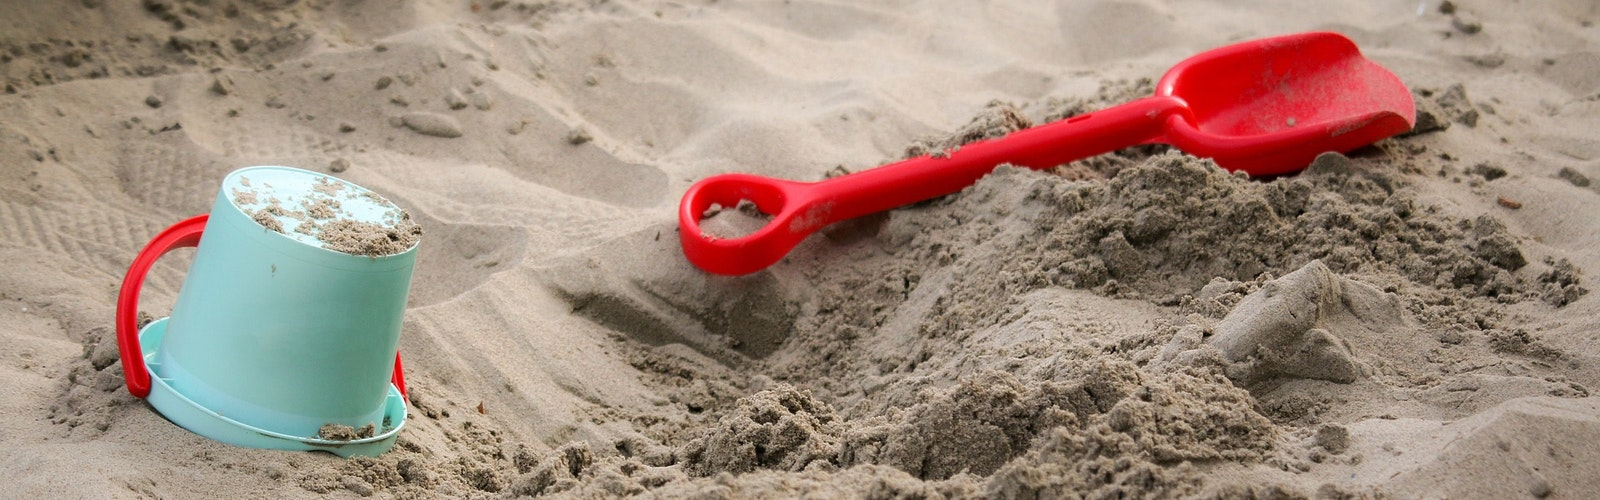 Sandbox with a shovel and bucket